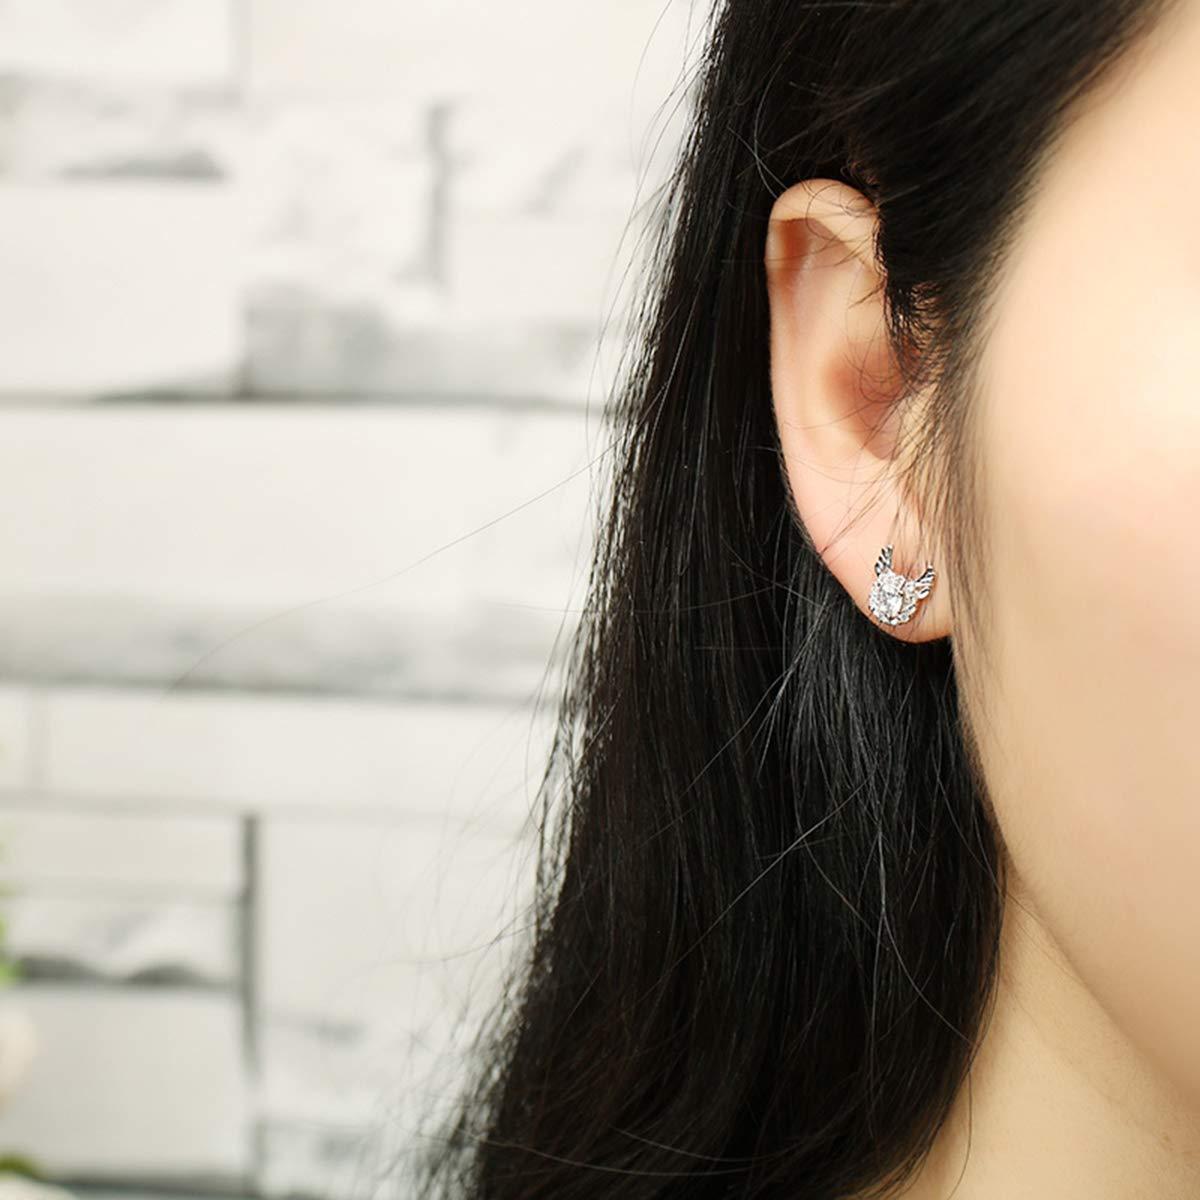 Silver Libaraba 925 Silver Rhinestone and Crystal Accent Deer Antler Stud Earrings with Jewelry Box,Deer Earrings for Women